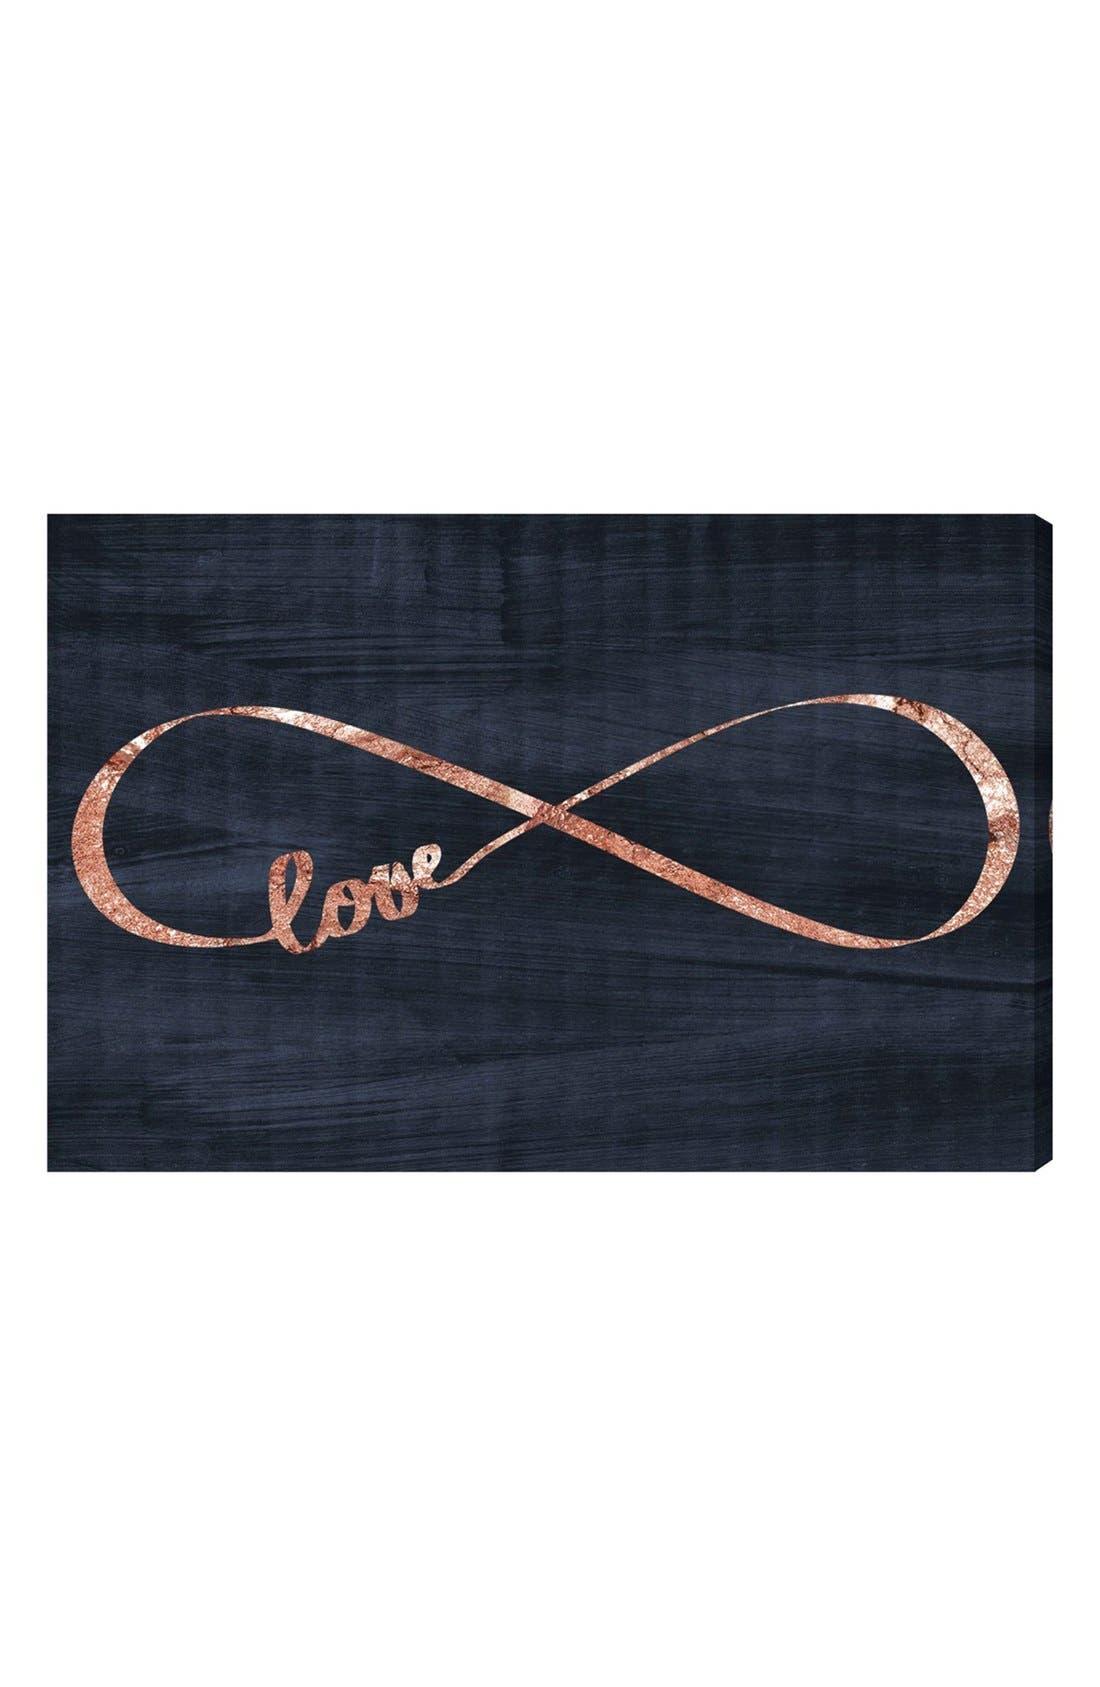 'Infinite Love' Canvas Wall Art,                             Main thumbnail 1, color,                             001